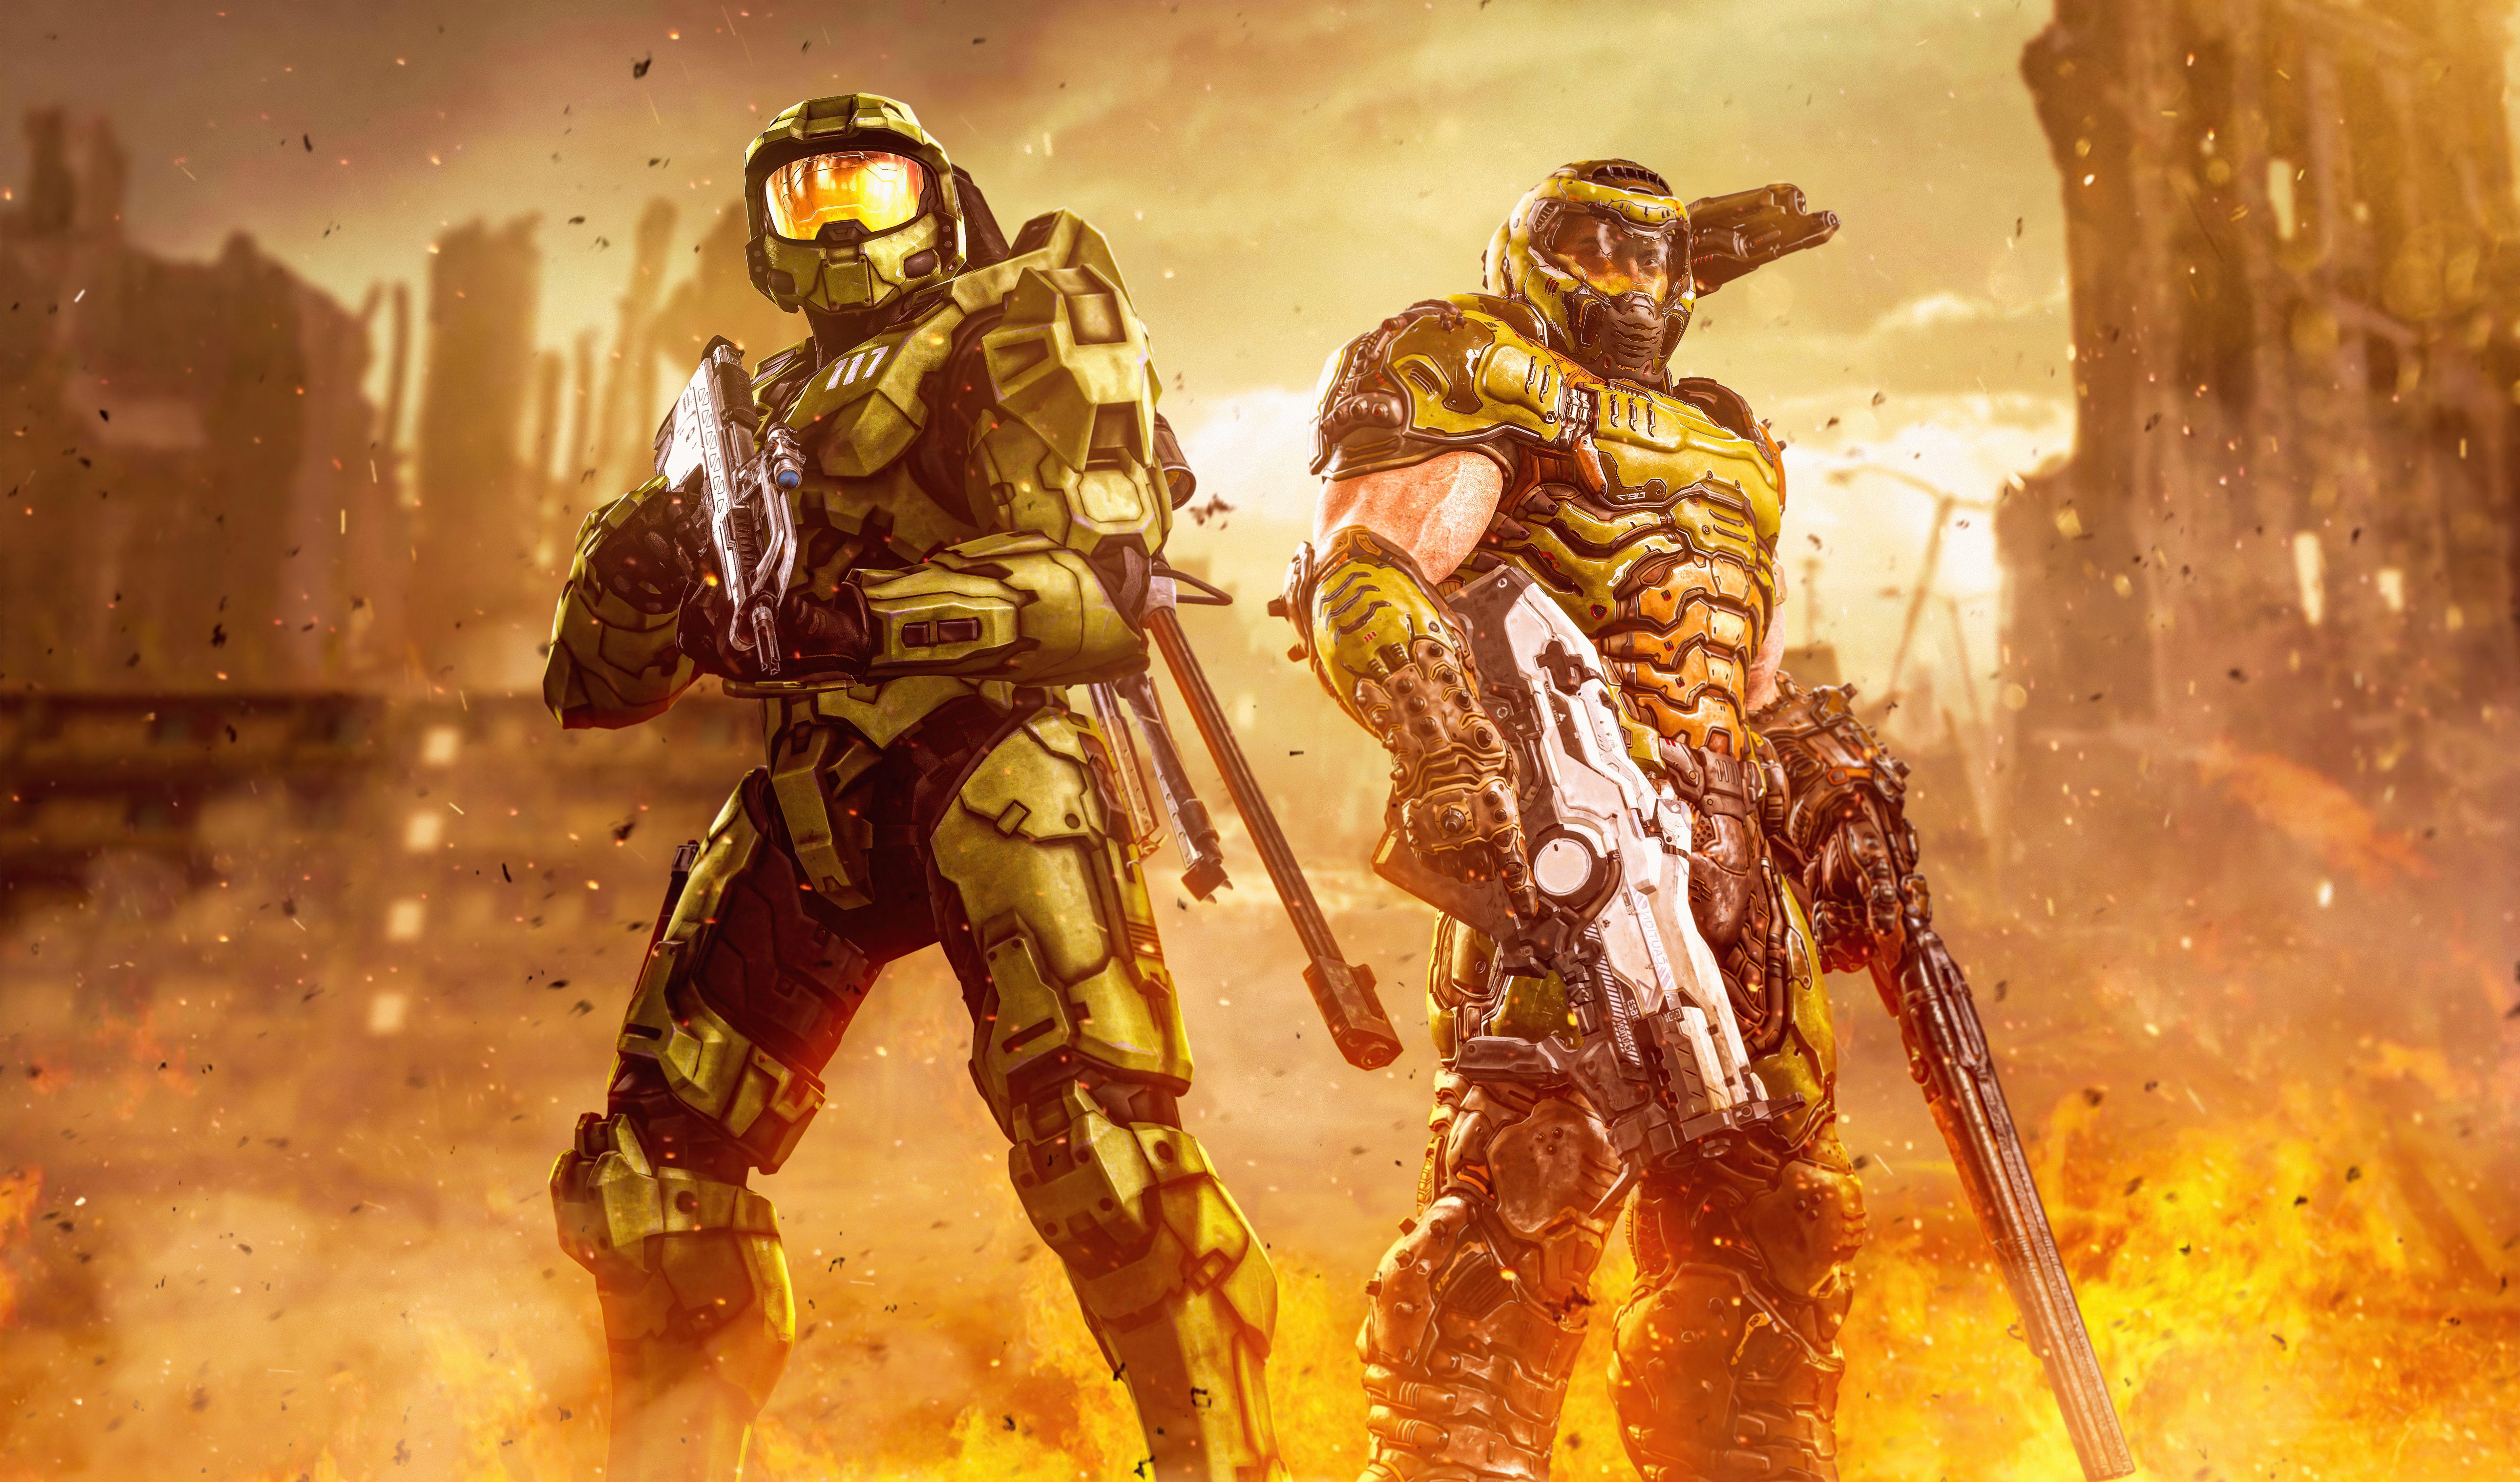 Fondos de pantalla Hombres verdes Halo Infinite